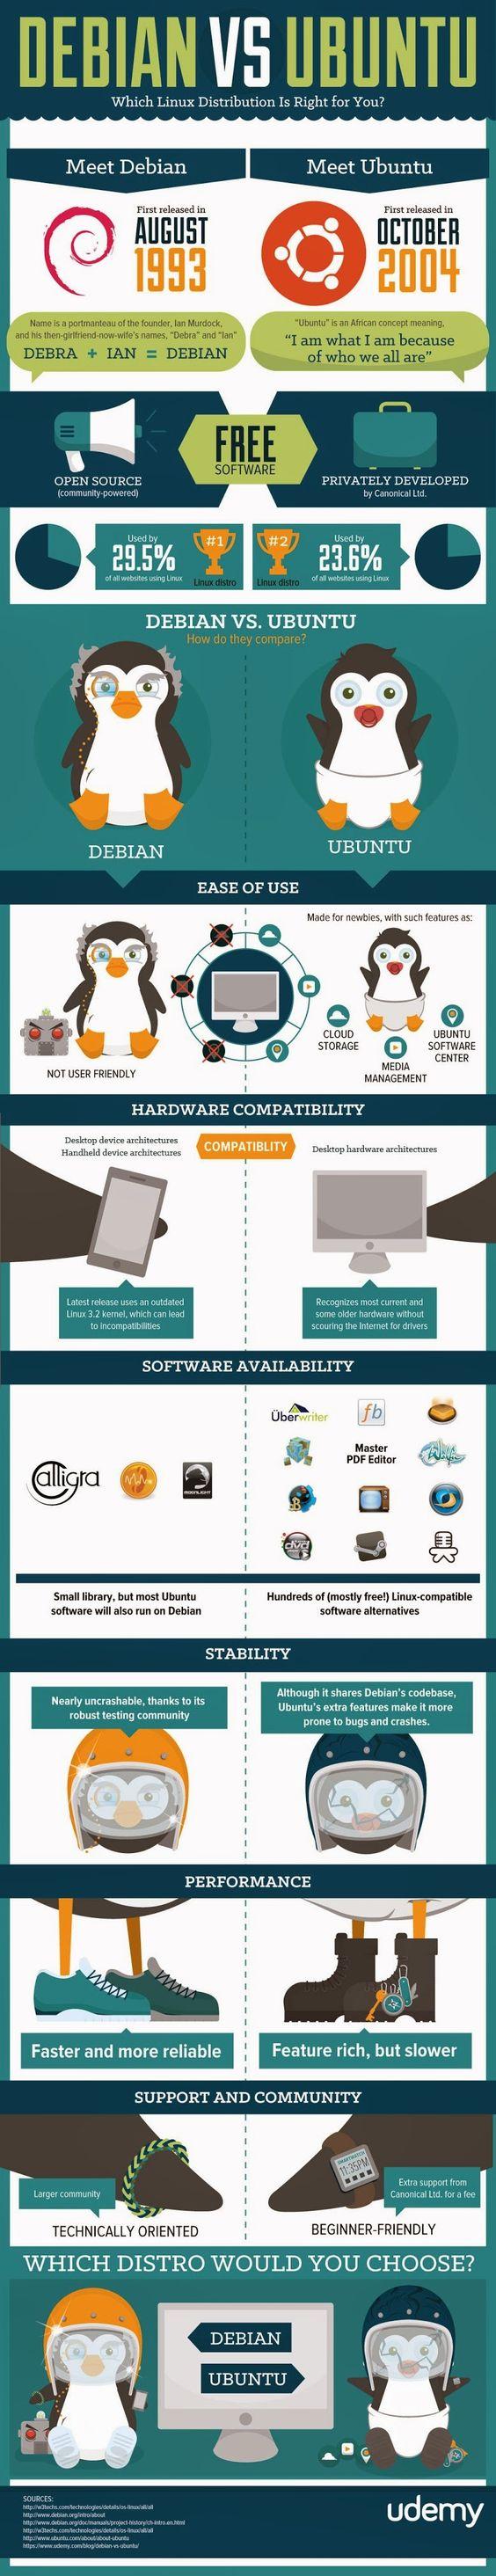 Debian vs. Ubuntu Linux